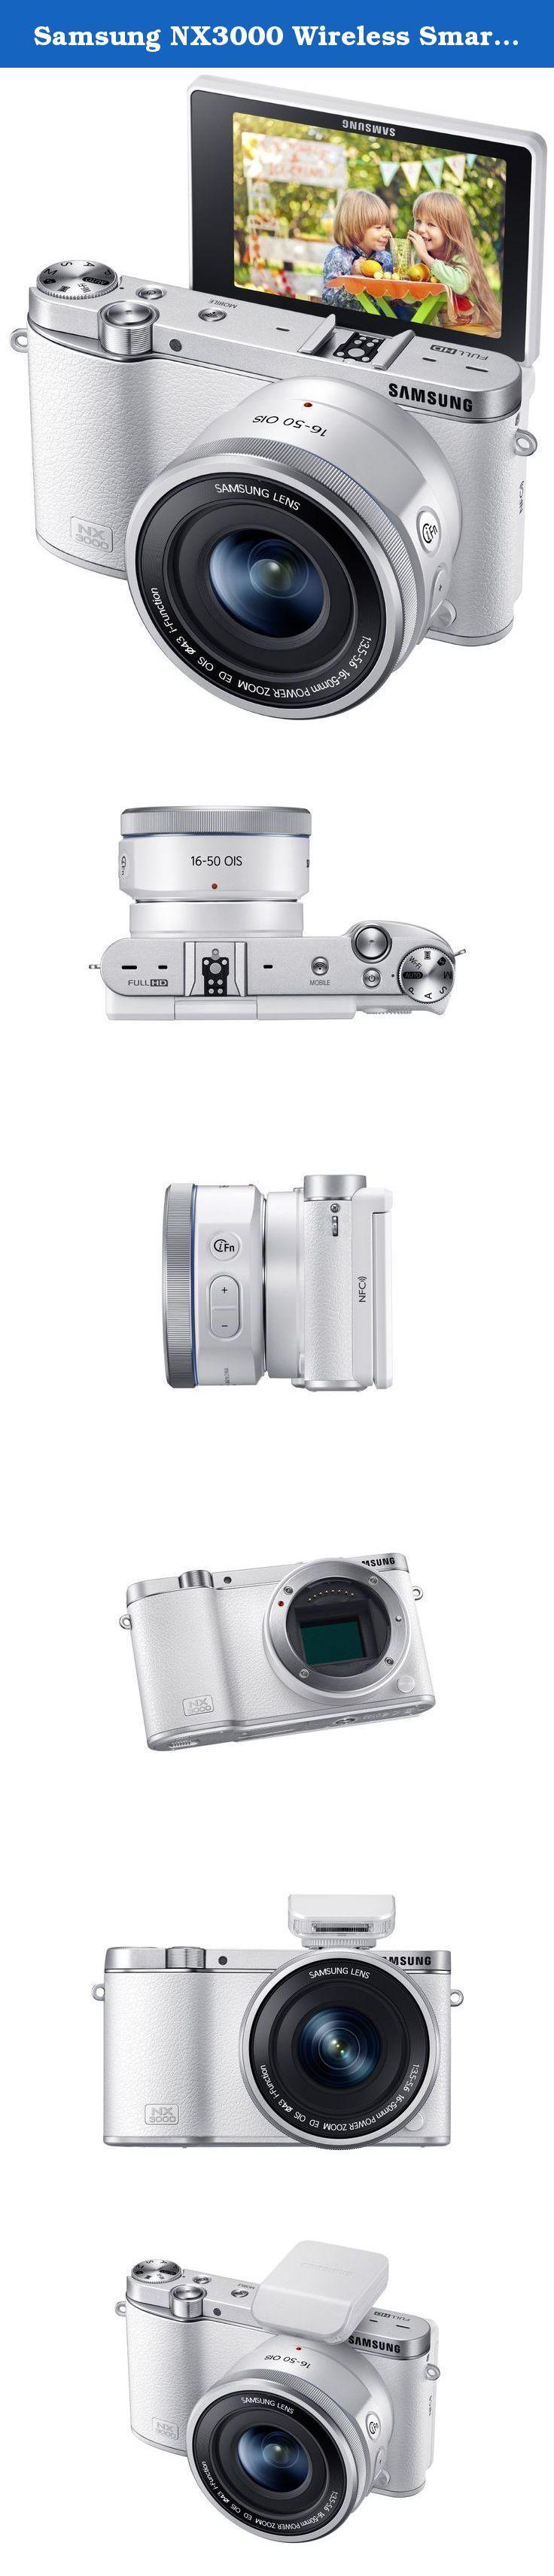 Samsung NX3000 Wireless Smart 20 3MP Mirrorless Digital Camera with 16 50mm OIS Power Zoom